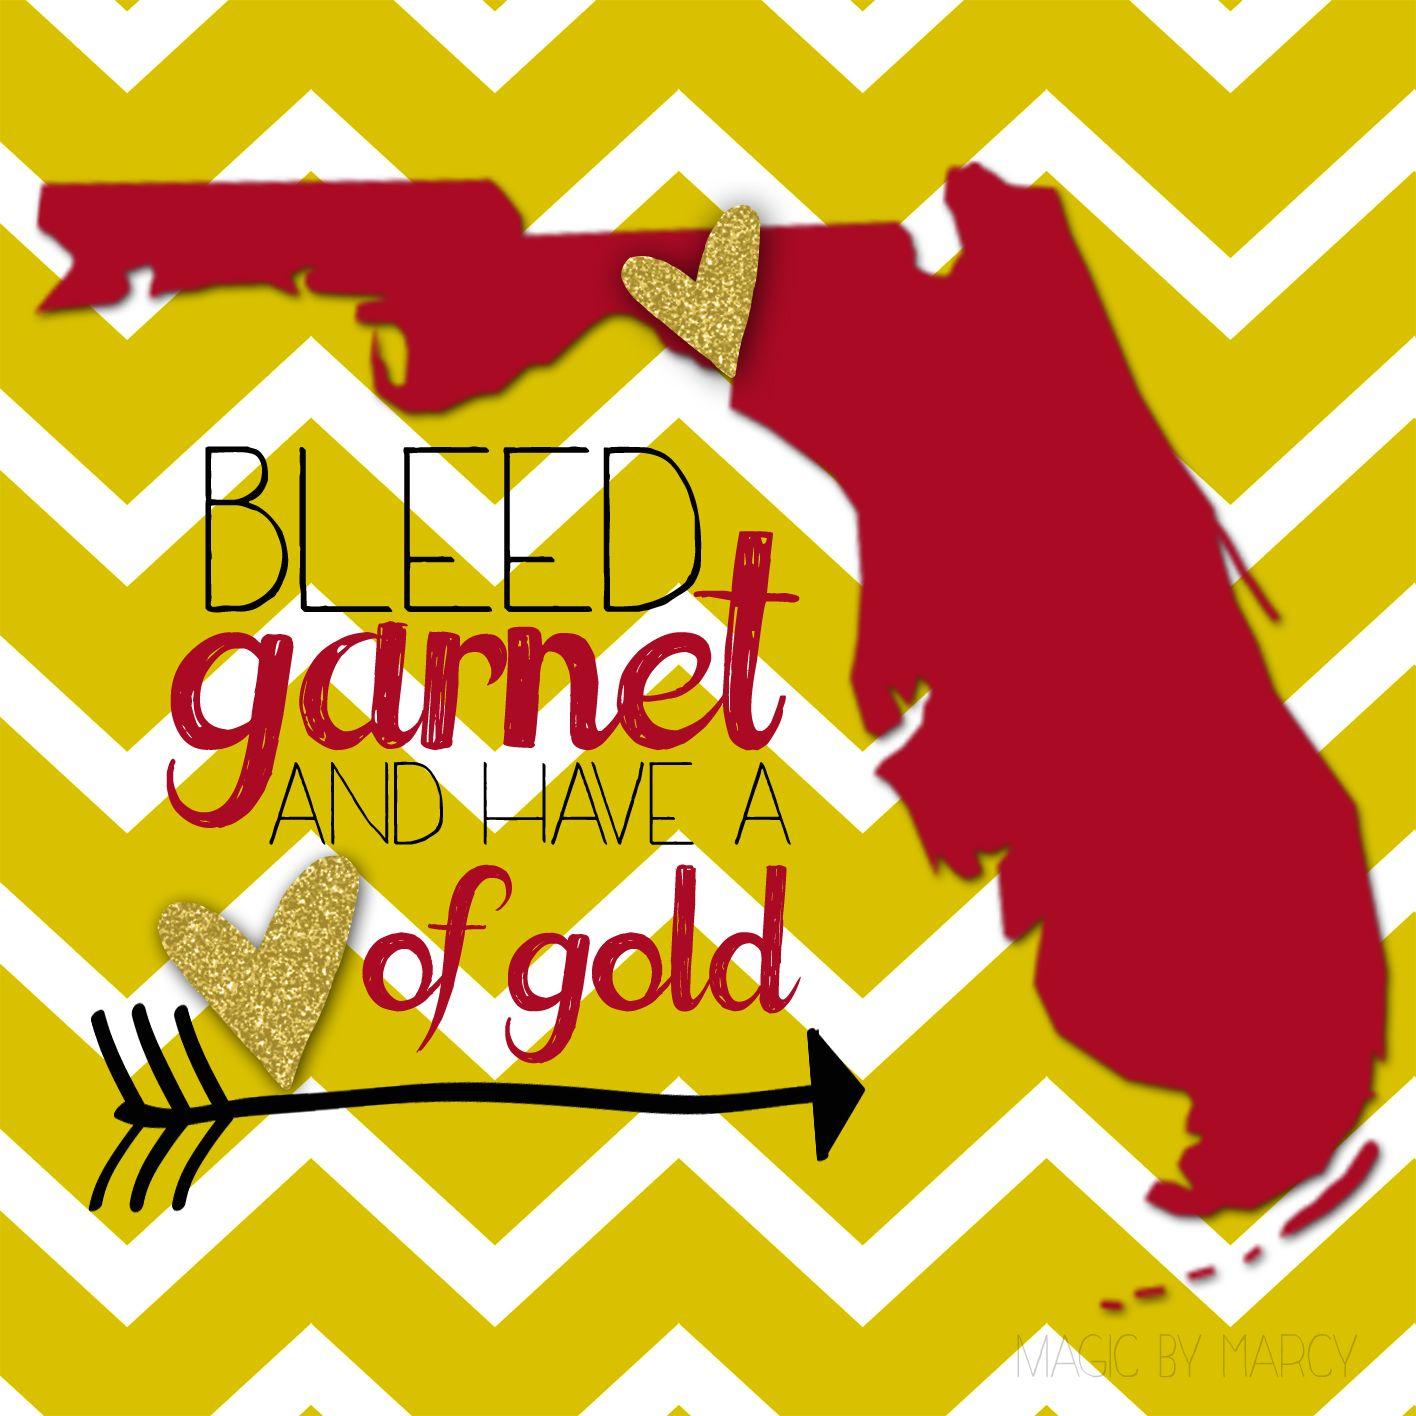 Florida State Seminoles Football Floor Mat: Florida State University National Champions! FSU Alumni Go